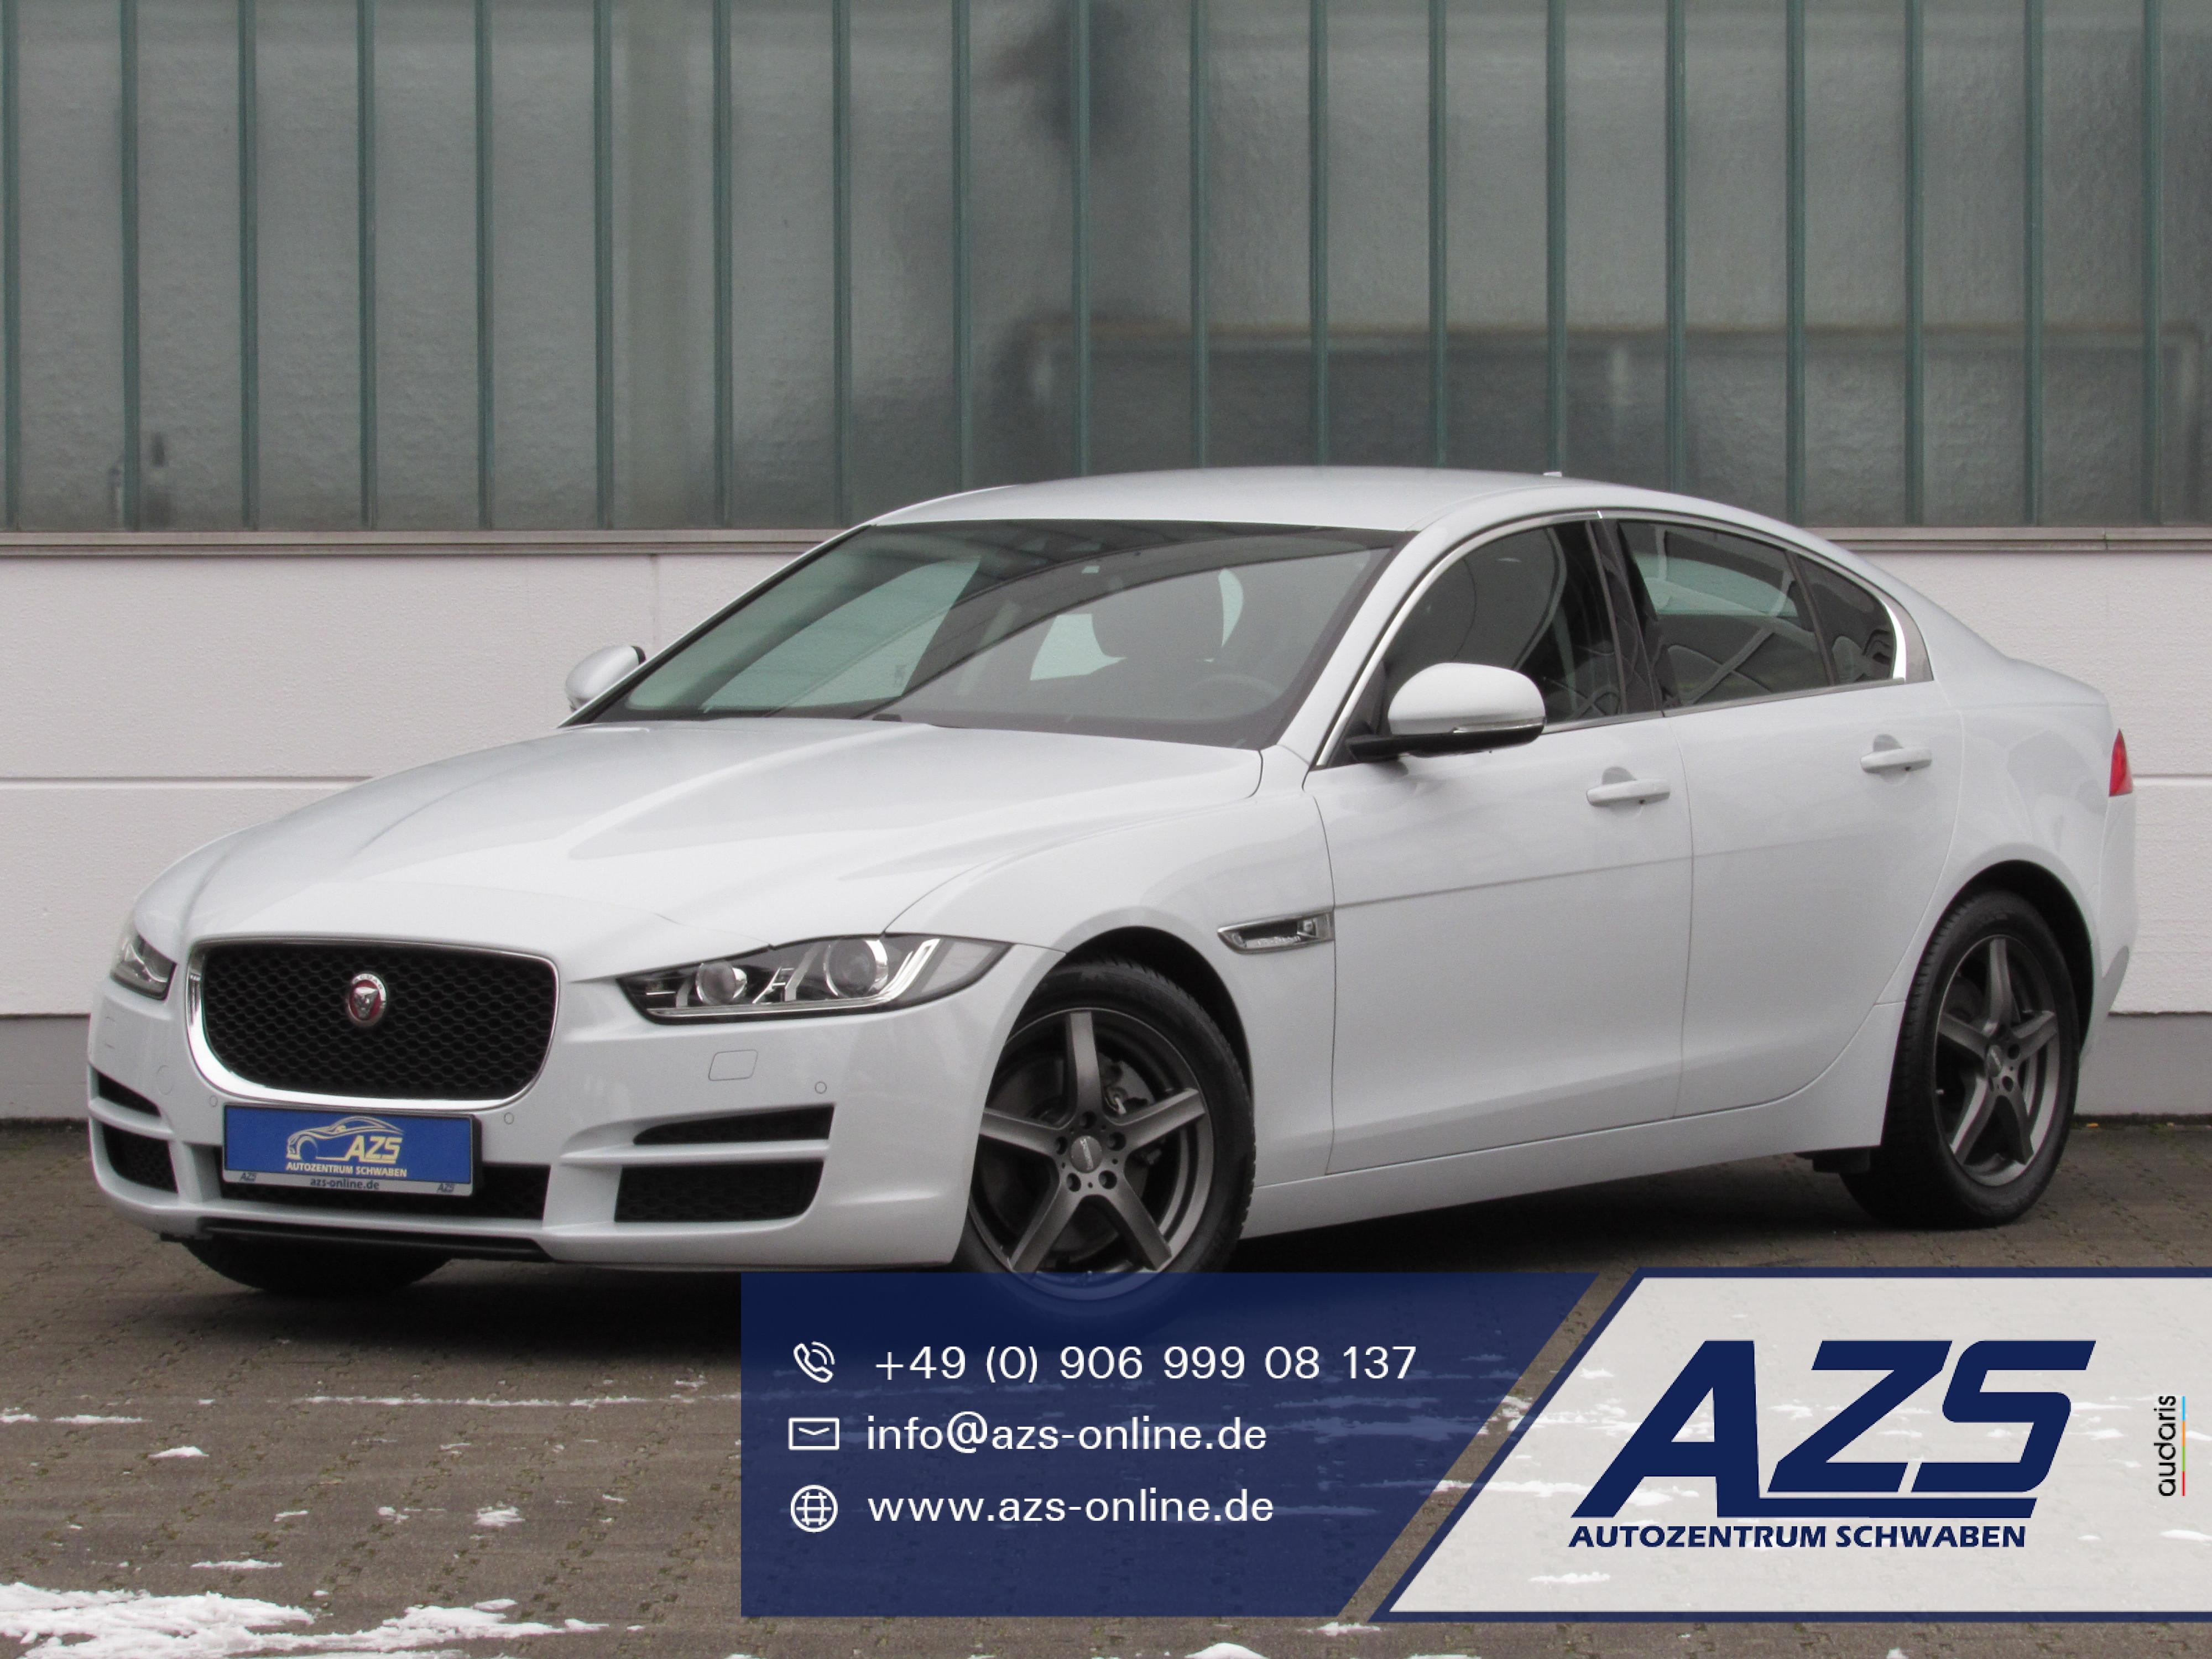 Jaguar XE 2.0d | Leder | AZS-SICHERER-ONLINE-KAUF, Jahr 2016, Diesel